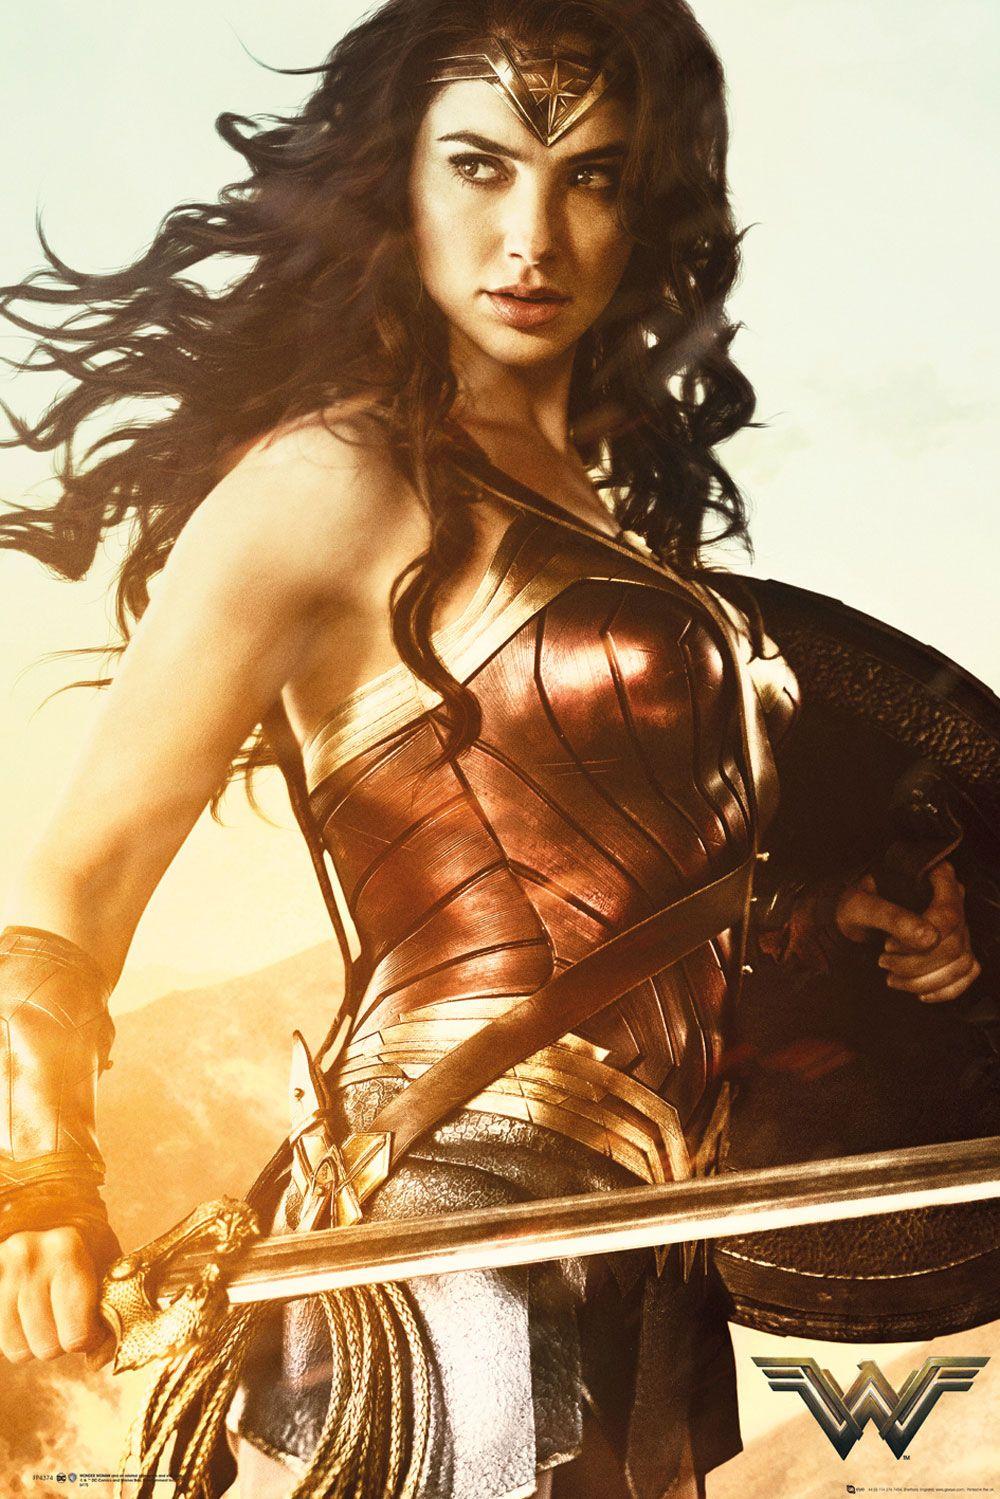 Wonder Woman Poster Pack Sword 61 x 91 cm (5)